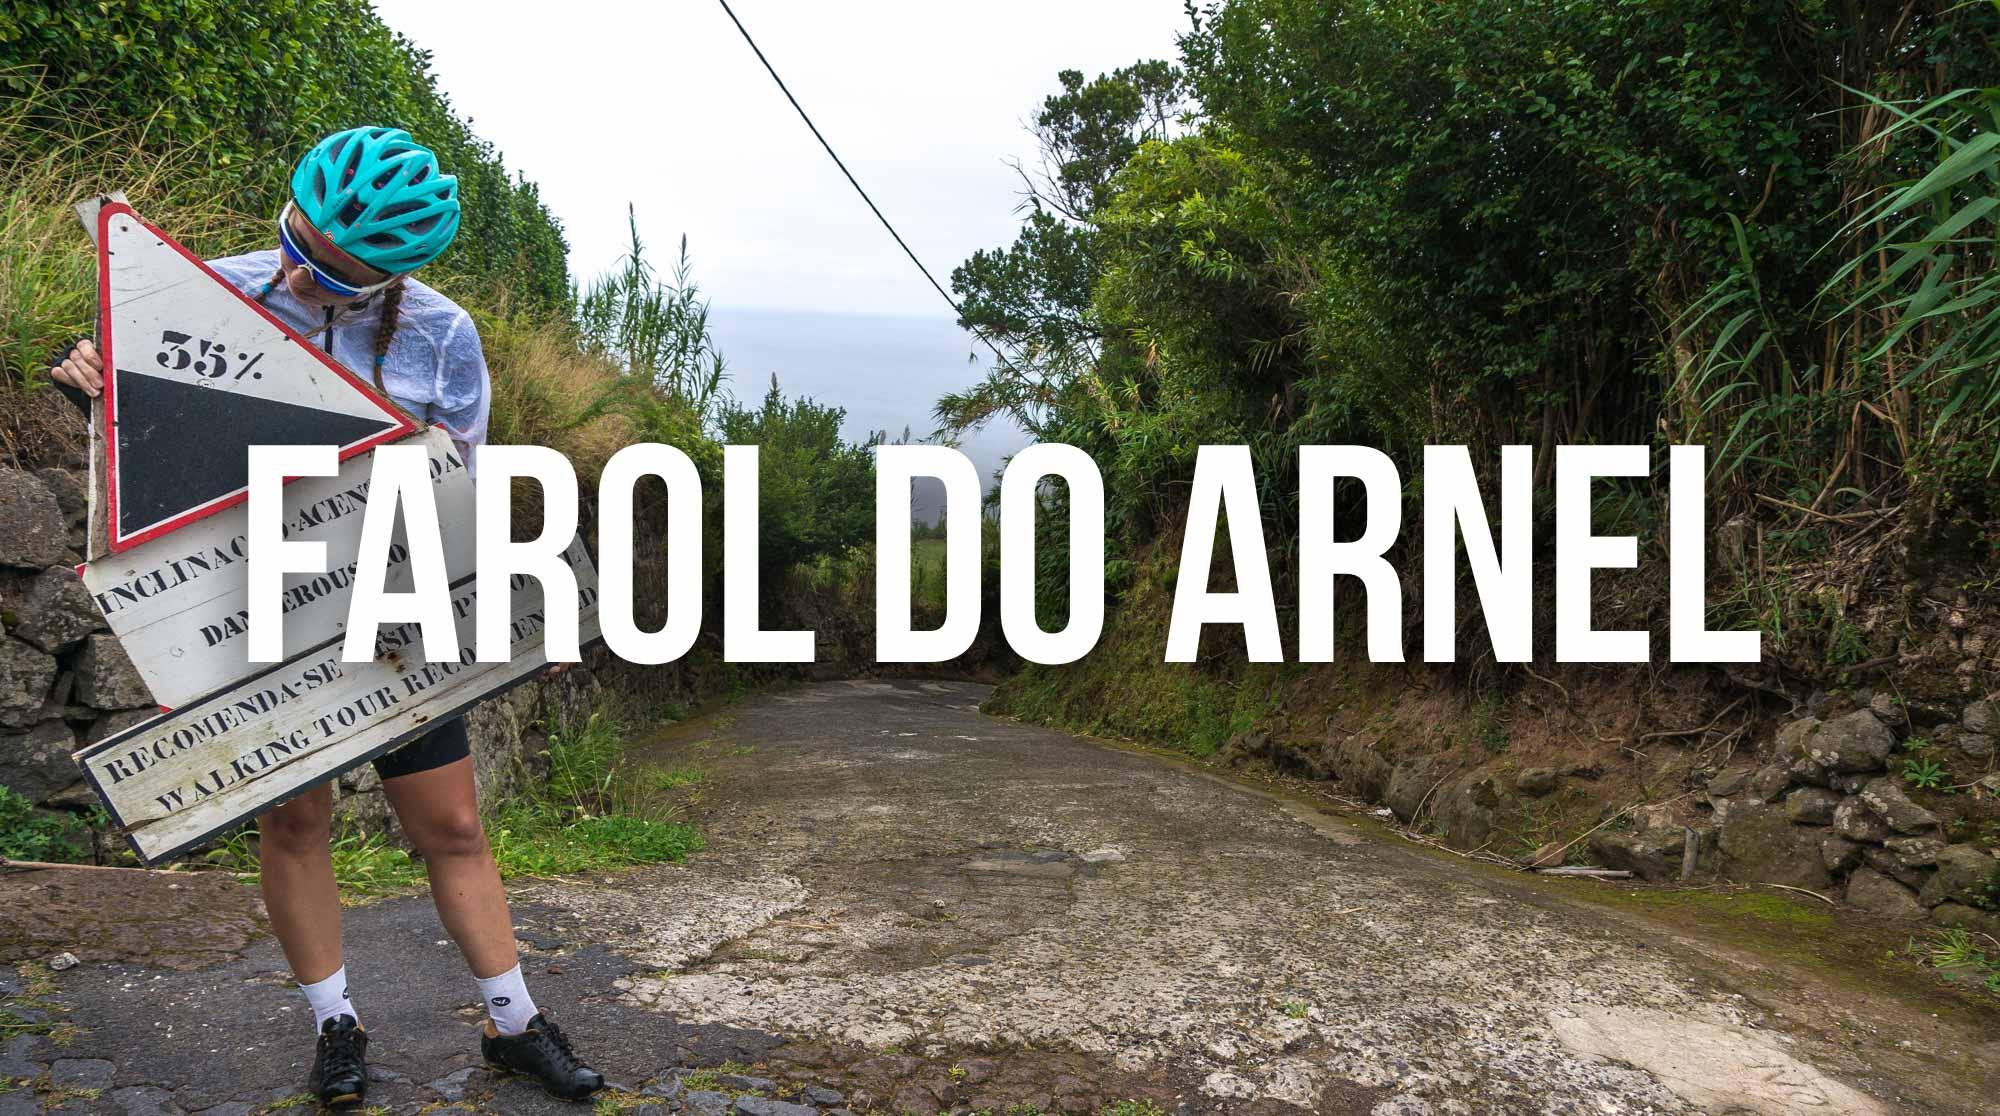 Farol do Arnel